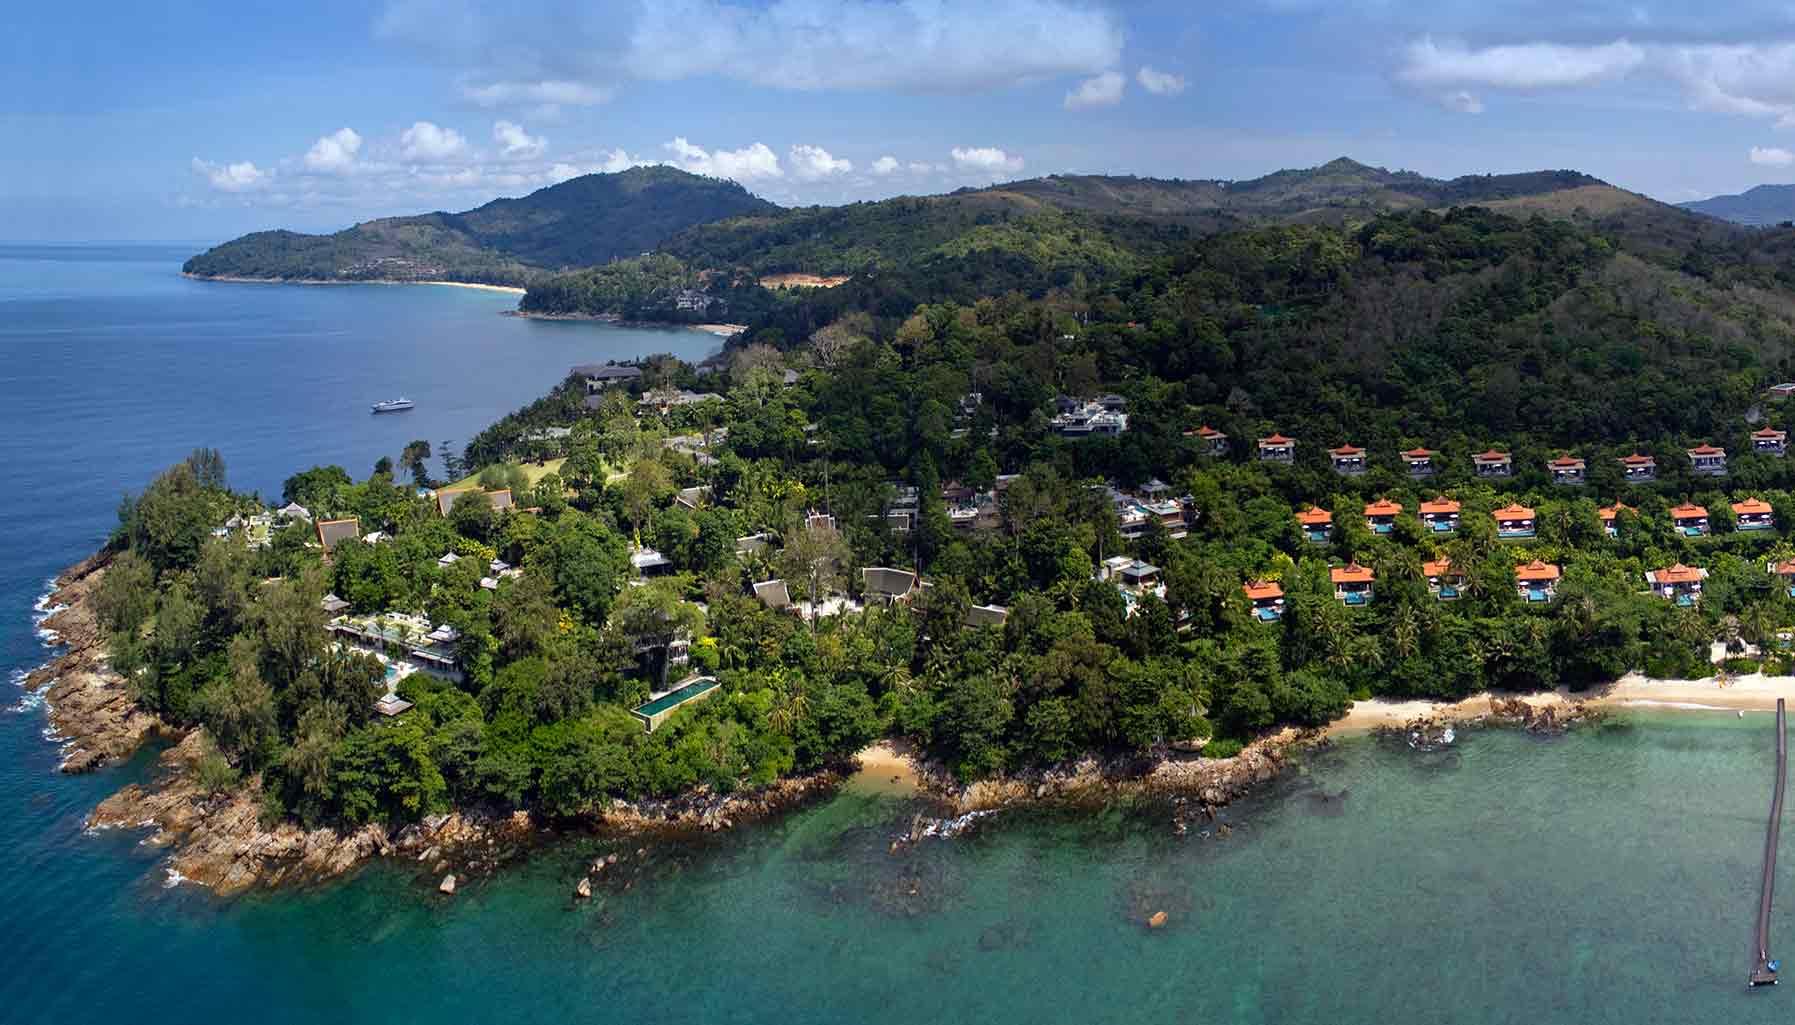 Luxury babymoon getaways near Singapore - Trisara Resort Phuket